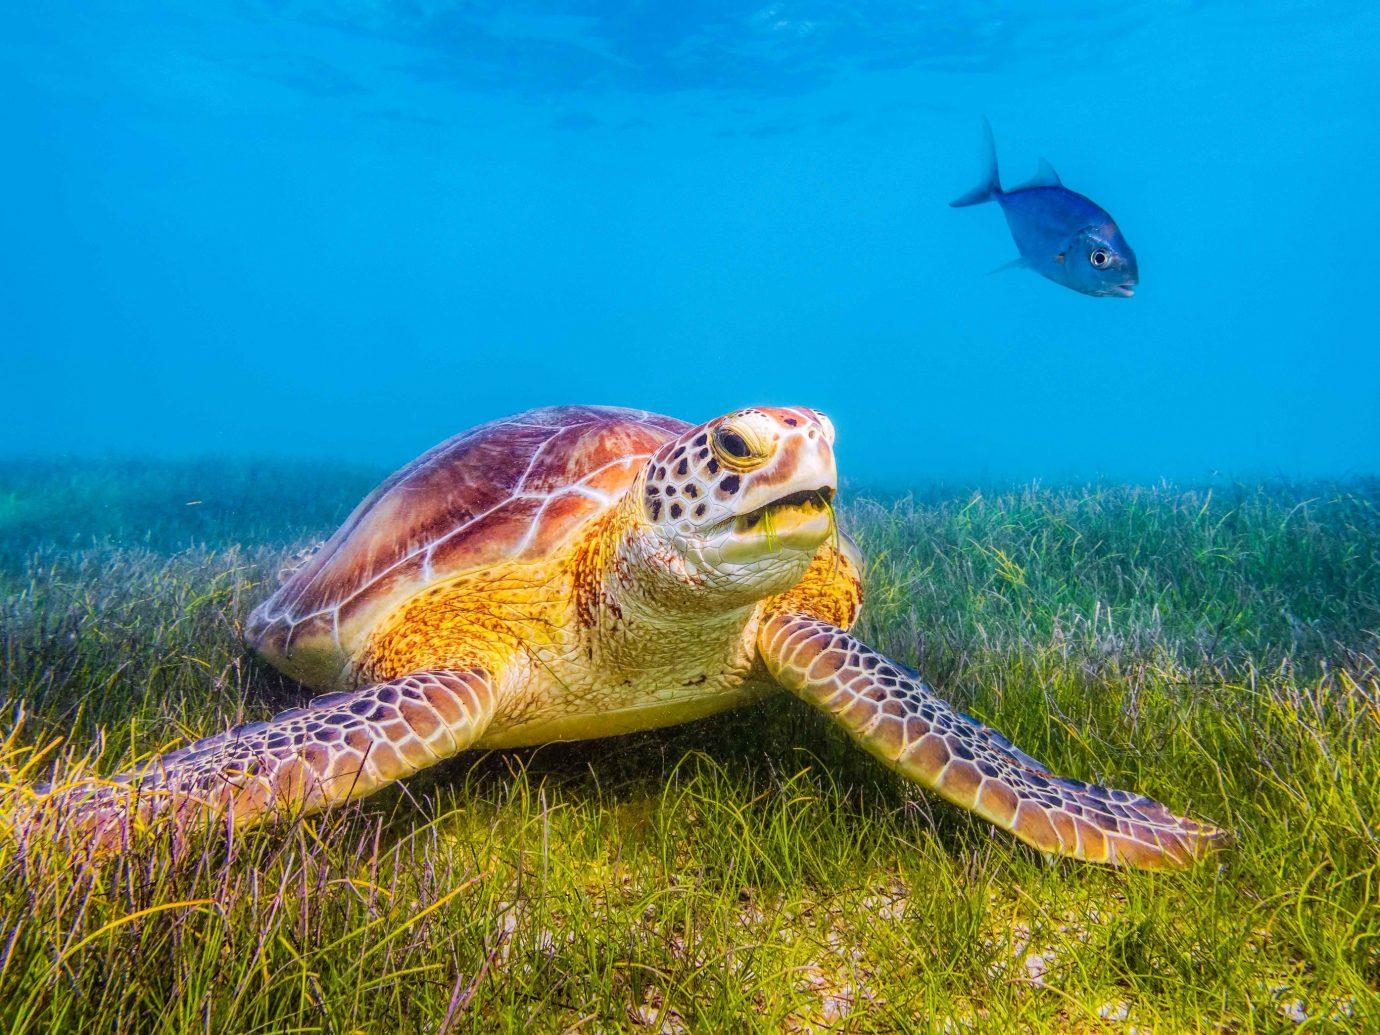 Mexico Trip Ideas Weekend Getaways sea turtle turtle ecosystem loggerhead marine biology underwater organism reptile tortoise terrestrial animal emydidae fish leatherback turtle